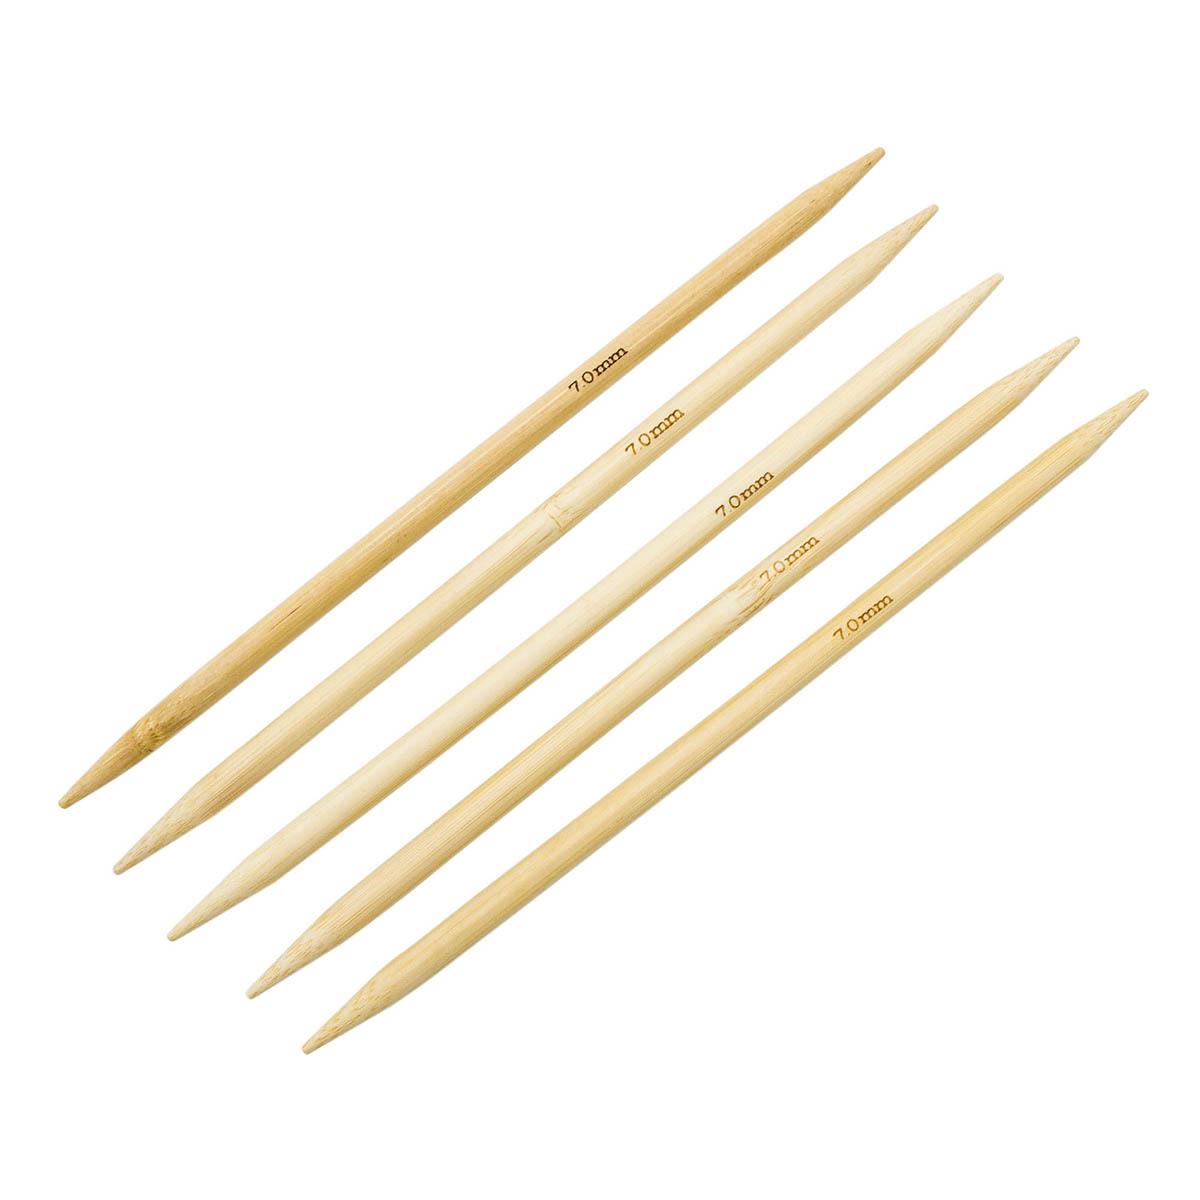 Спицы носочные бамбук, 20 см, 7,0 мм (942570), Hobby&Pro